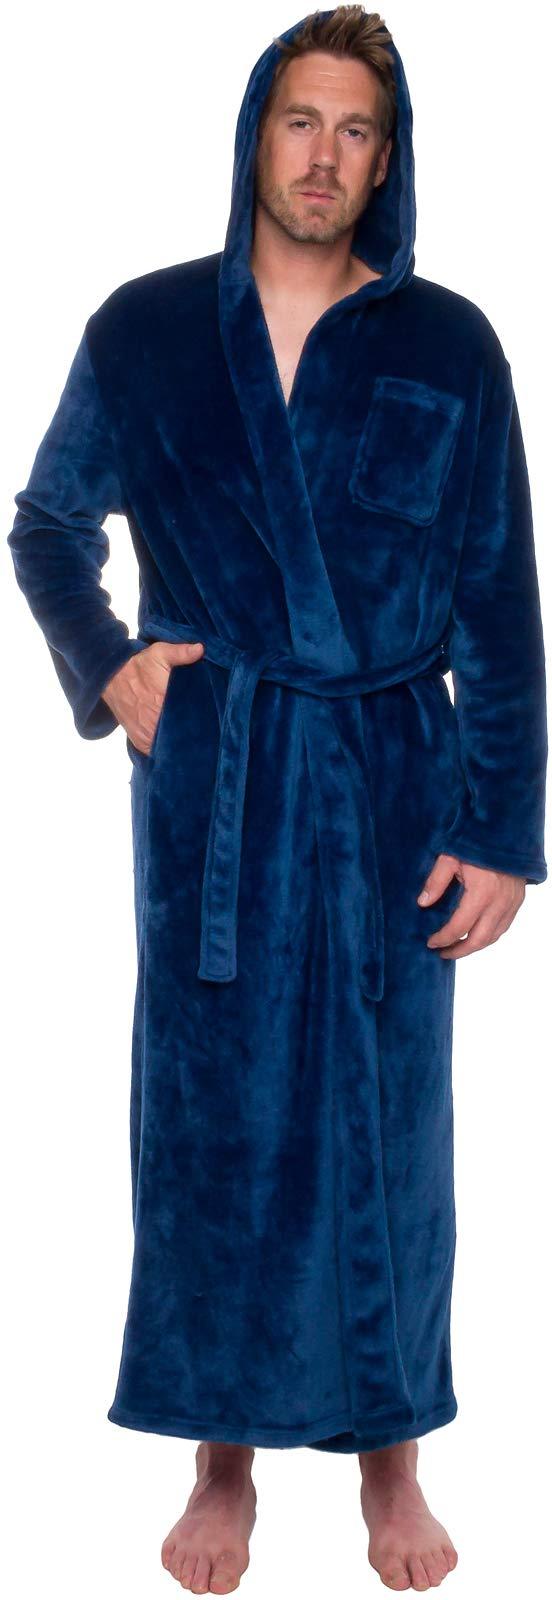 Ross Michaels Mens Hooded Long Robe - Full Length Big & Tall Bathrobe (Navy, L/XL)